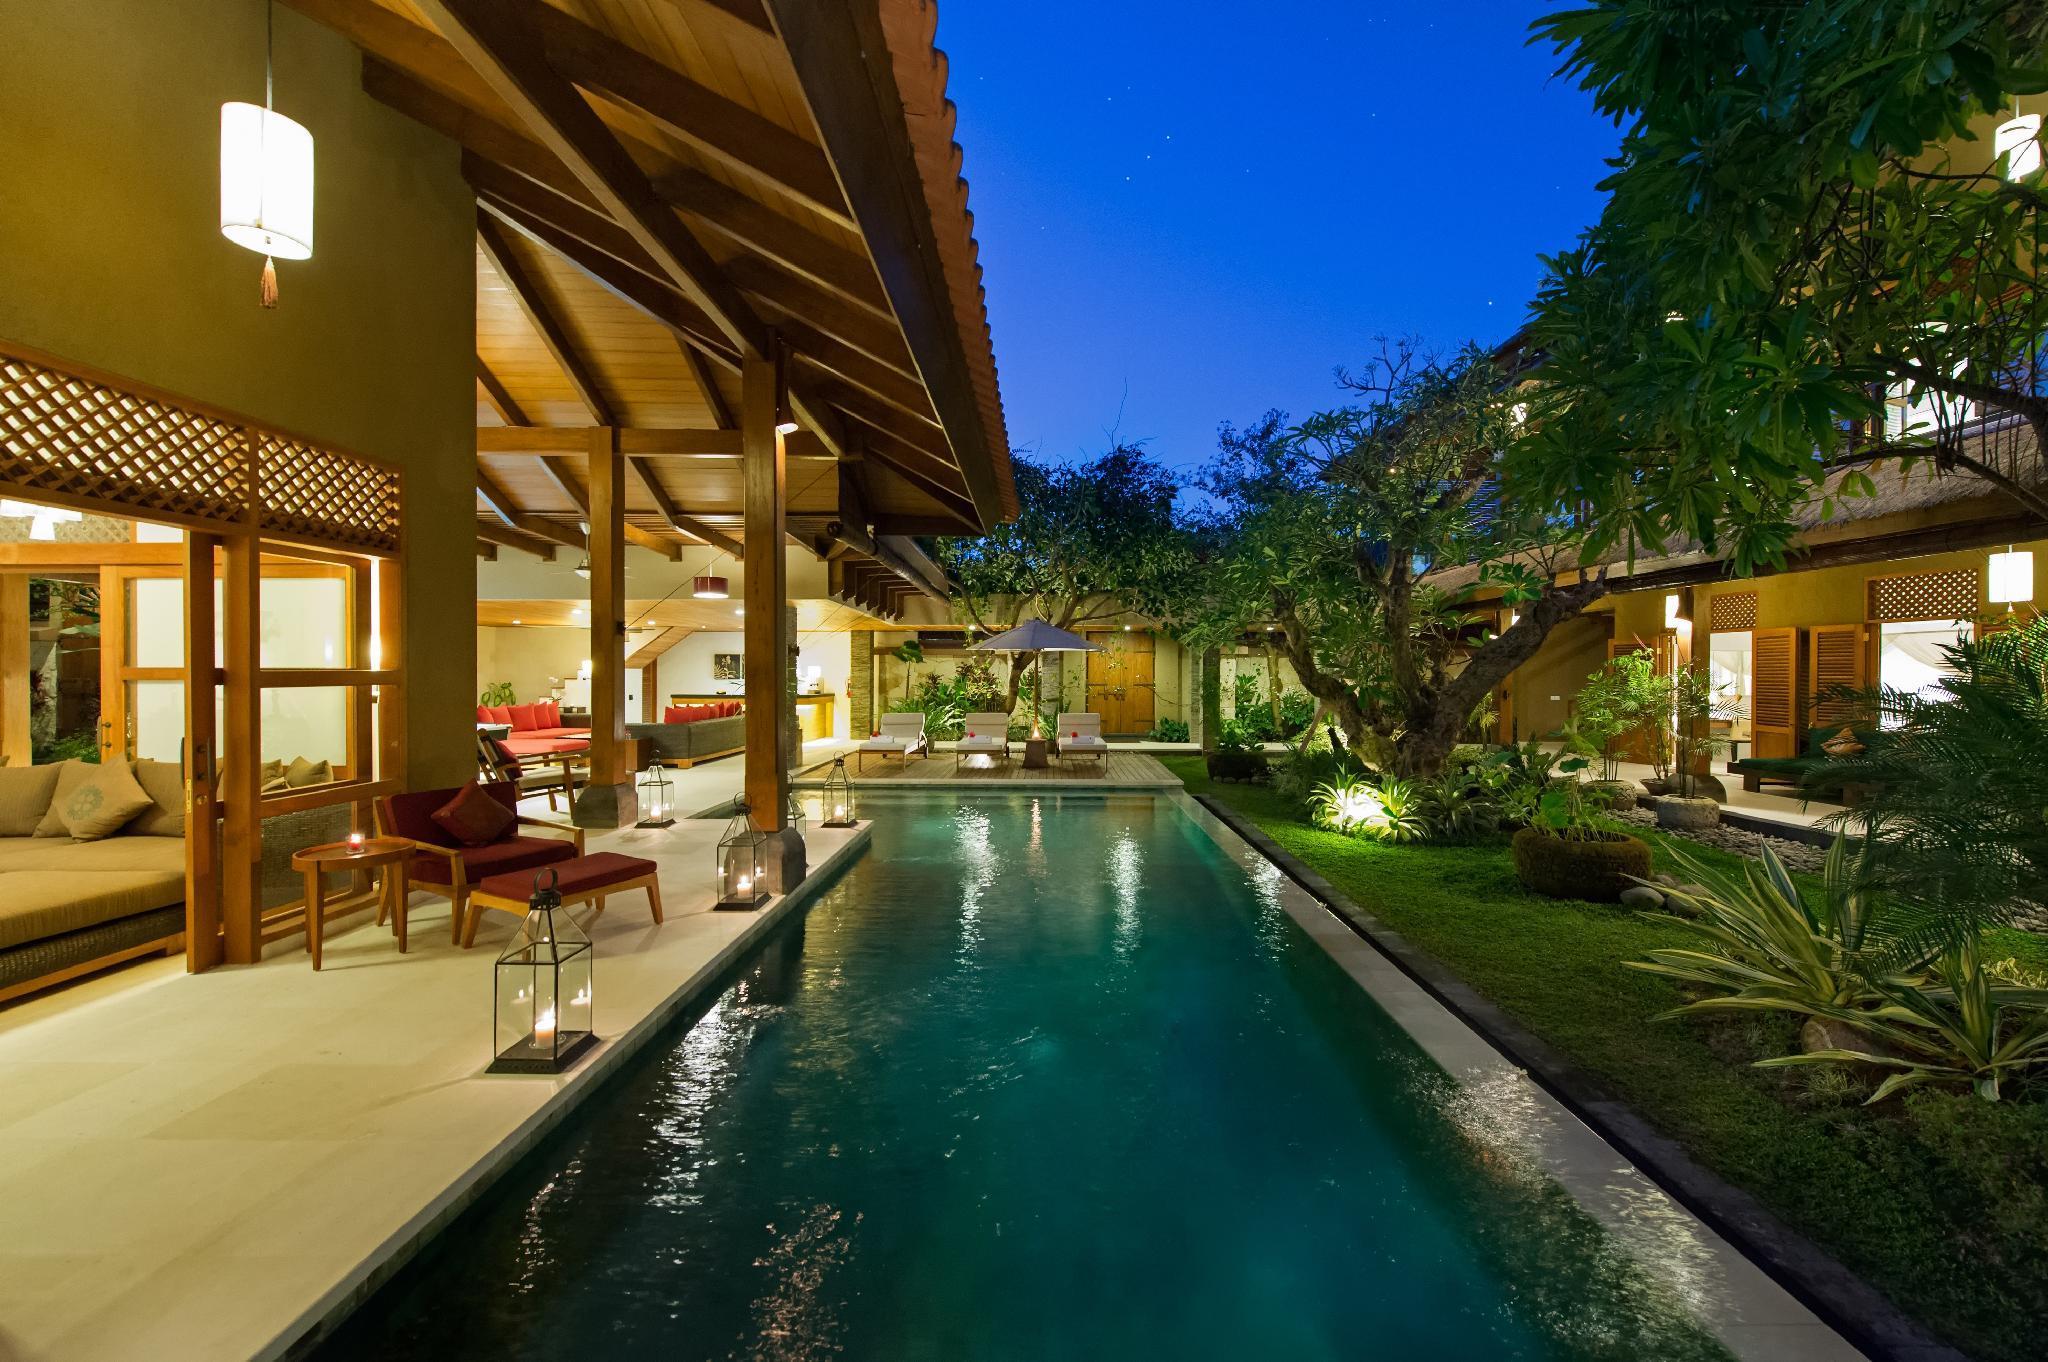 Luxury 9 BR Private Villa by the beach